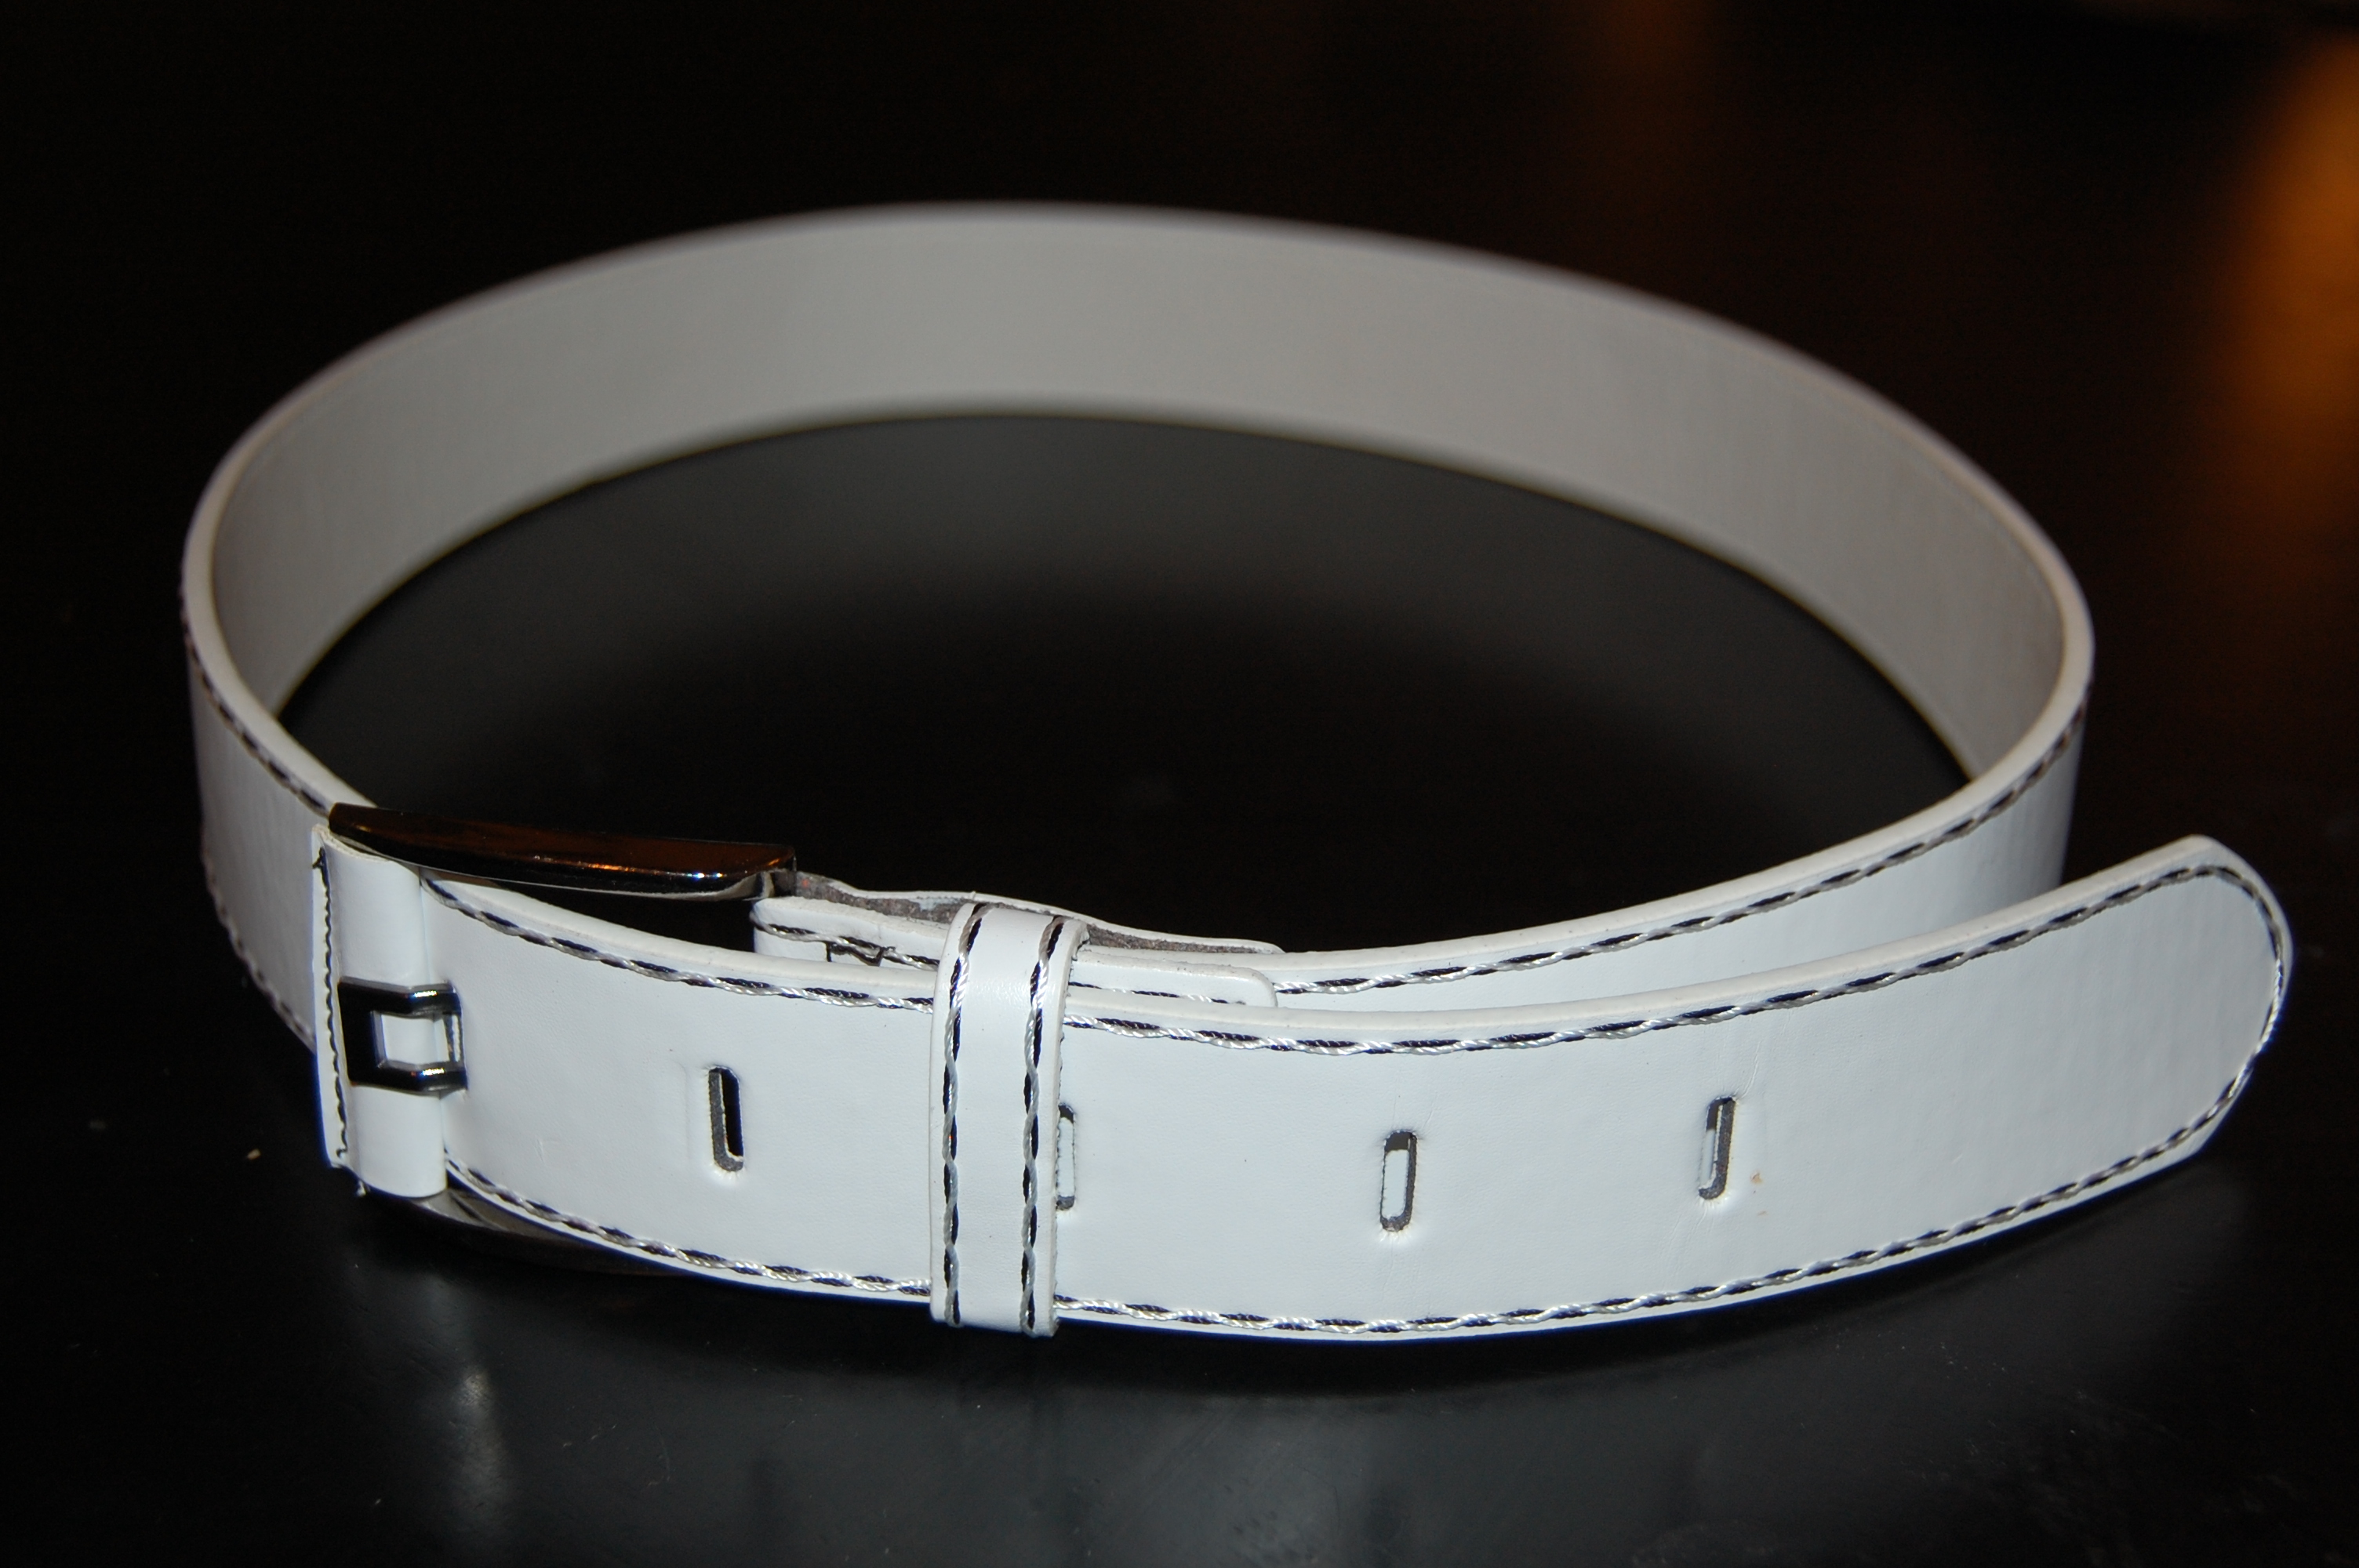 White Belt, Accessory, Belt, Clothes, Fabric, HQ Photo